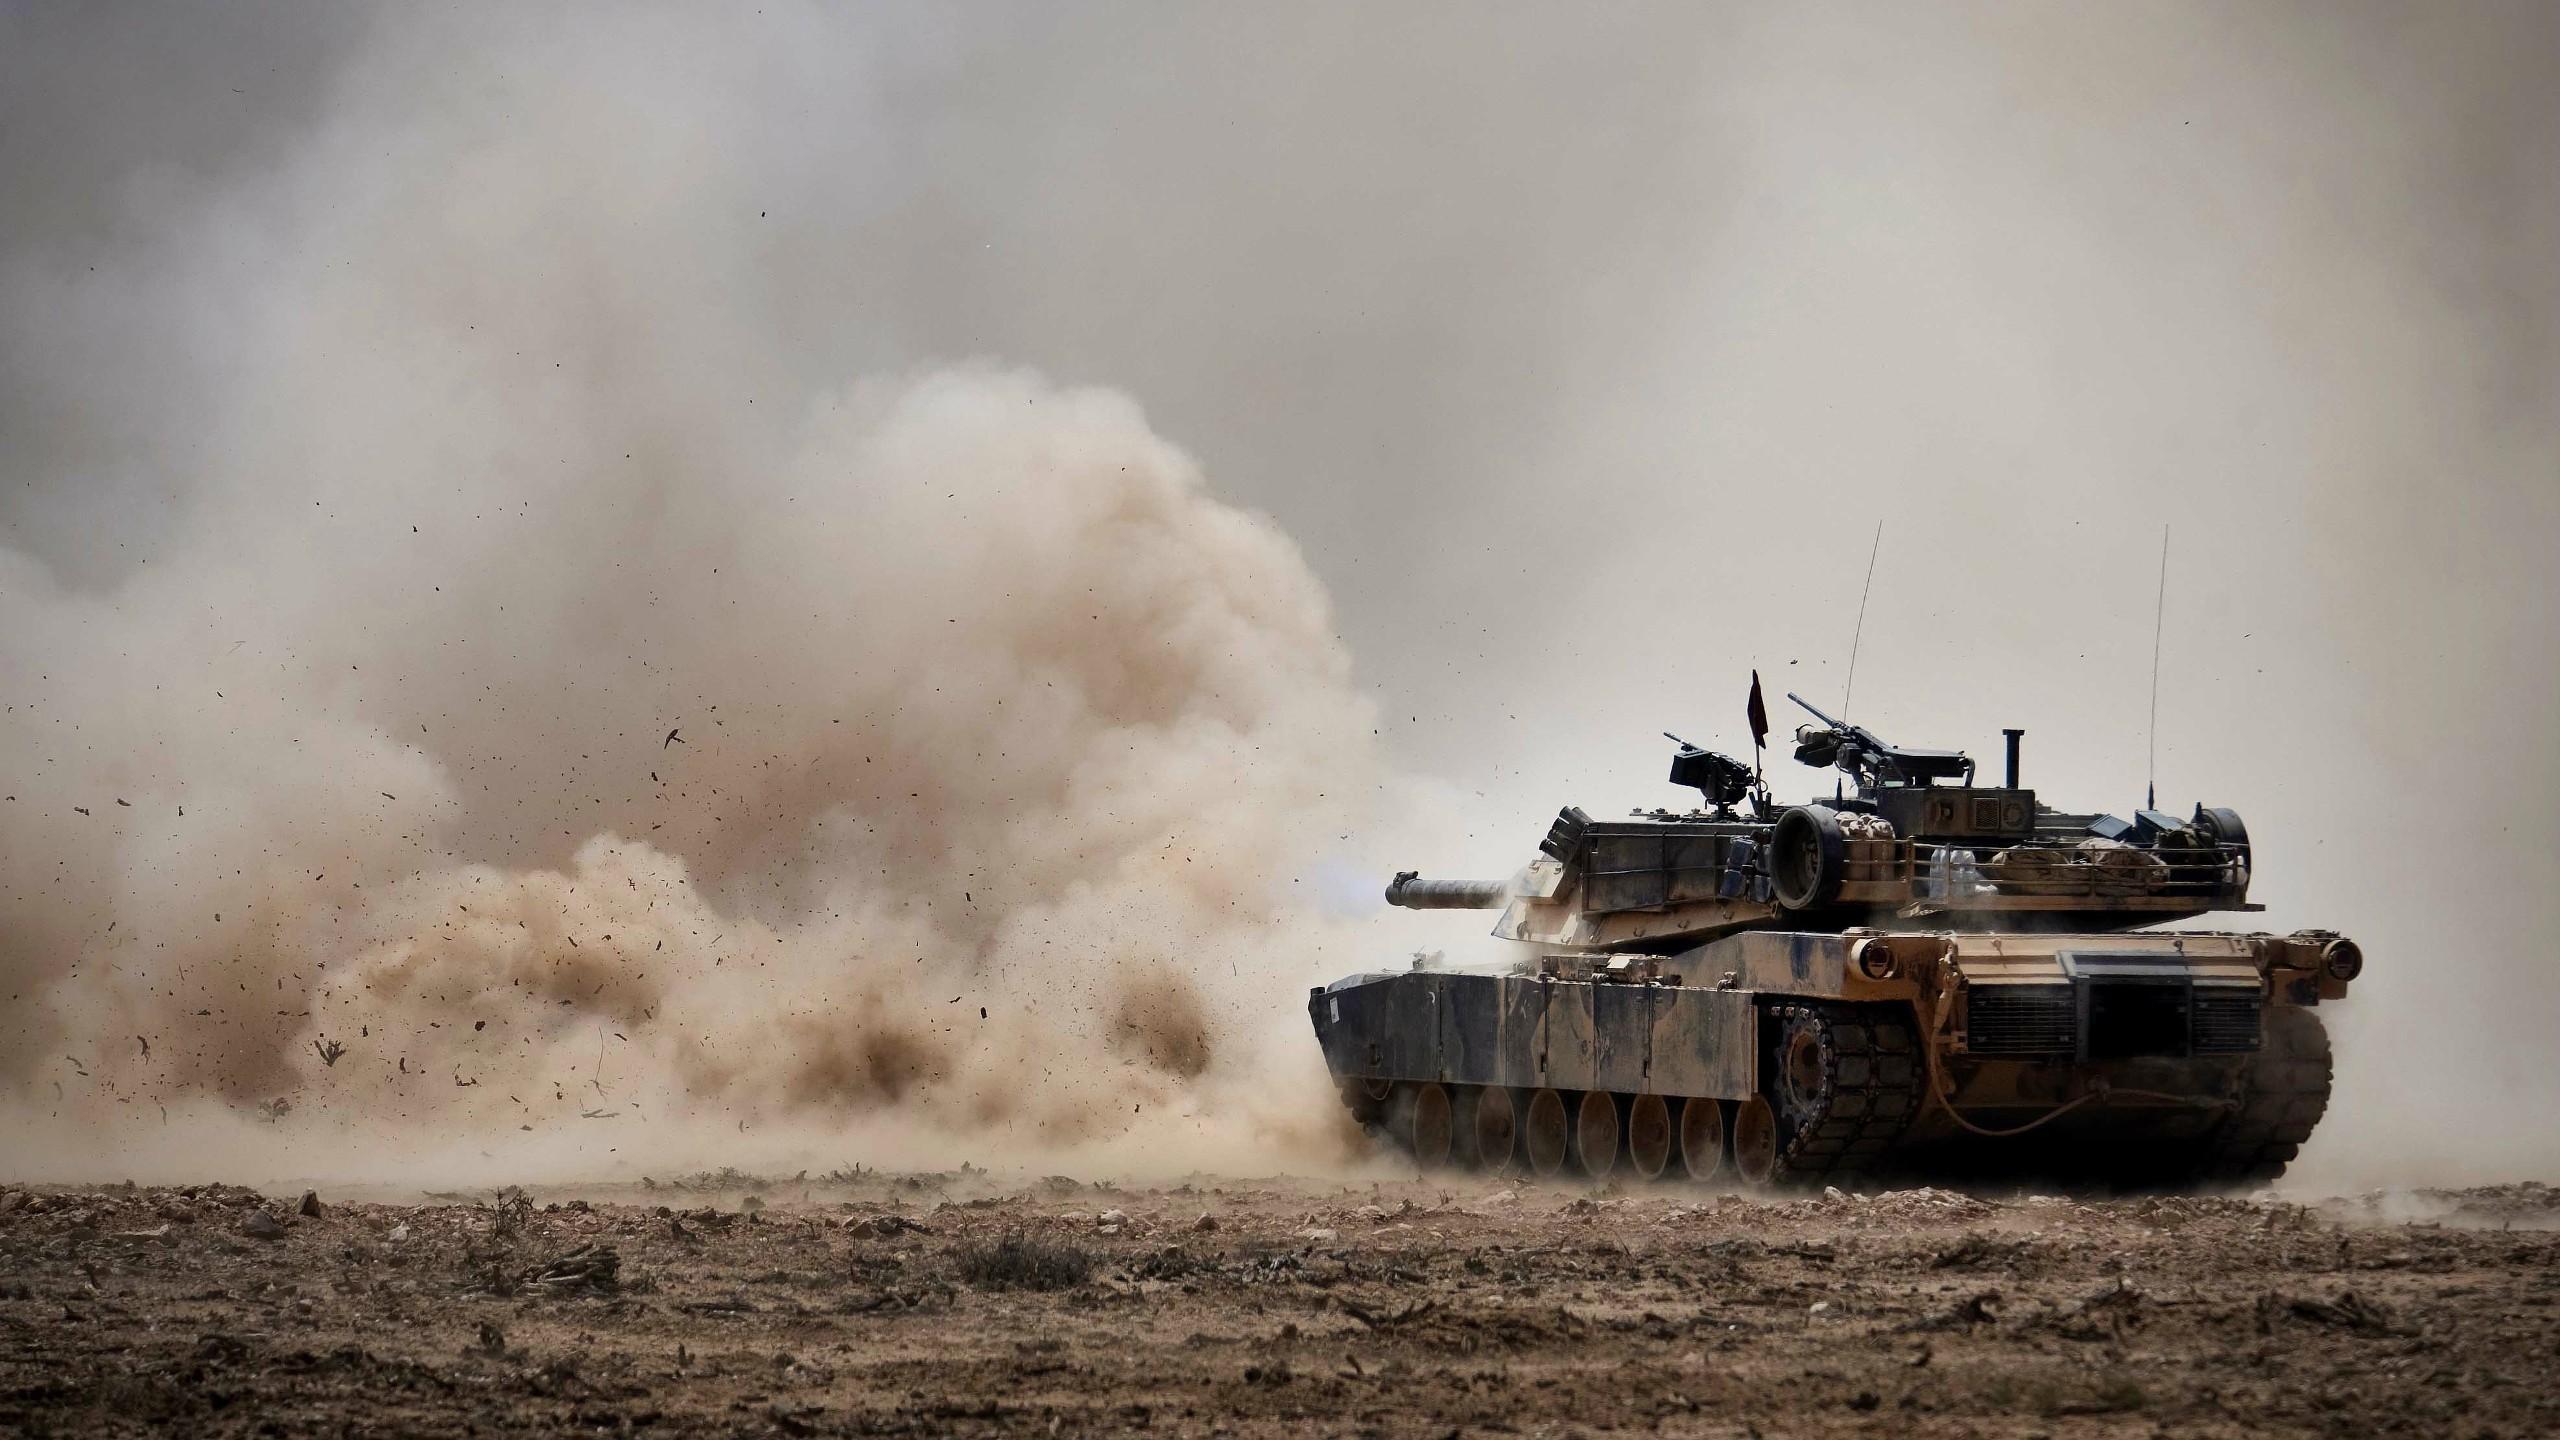 2560x1440 military, Tank, M1 Abrams, USMC Wallpaper HD